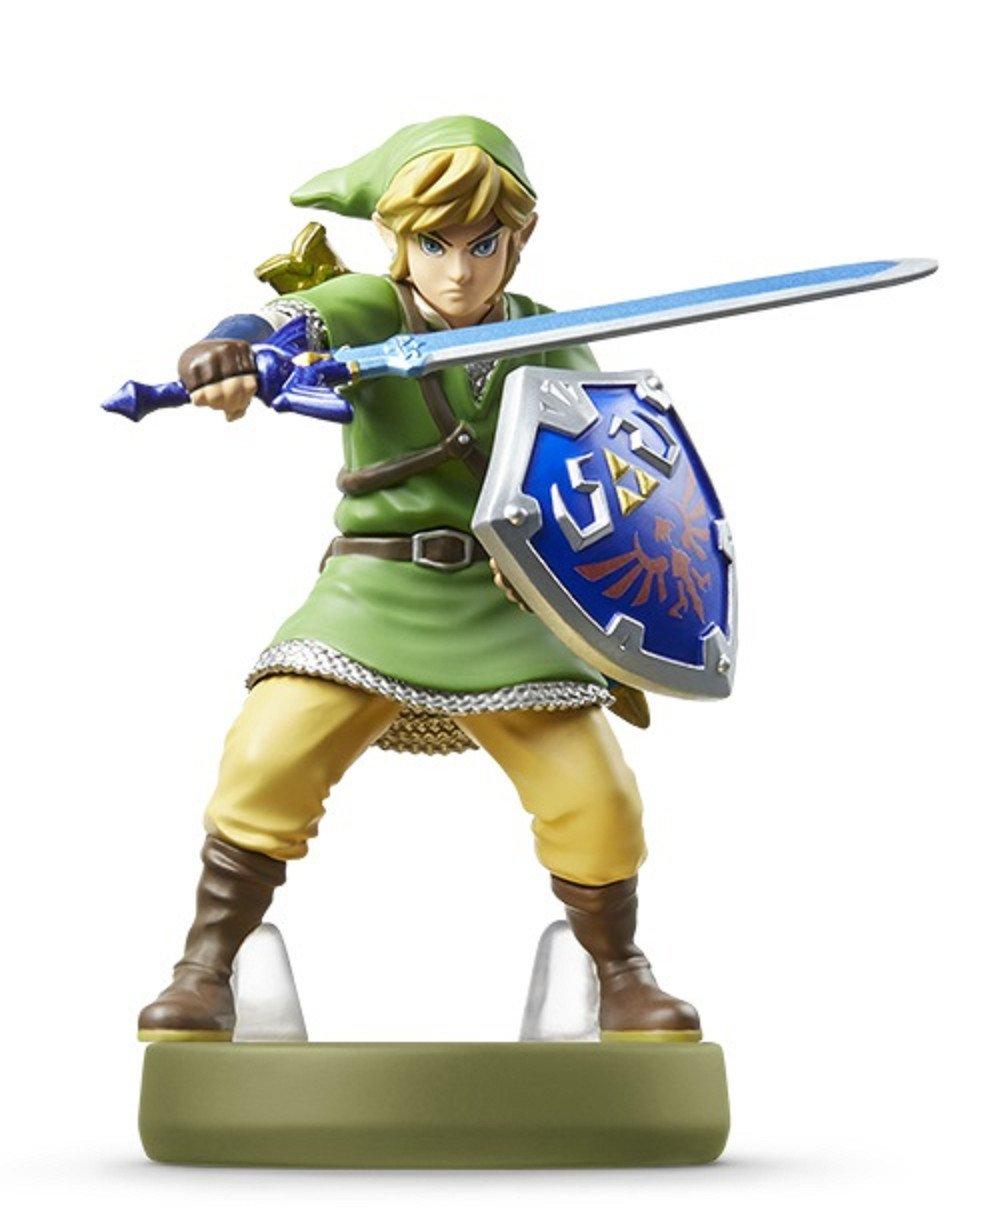 Nintendo amiibo Link - skyward sword (Series : The legend of Zelda) Japan Import by Nintendo (Image #1)